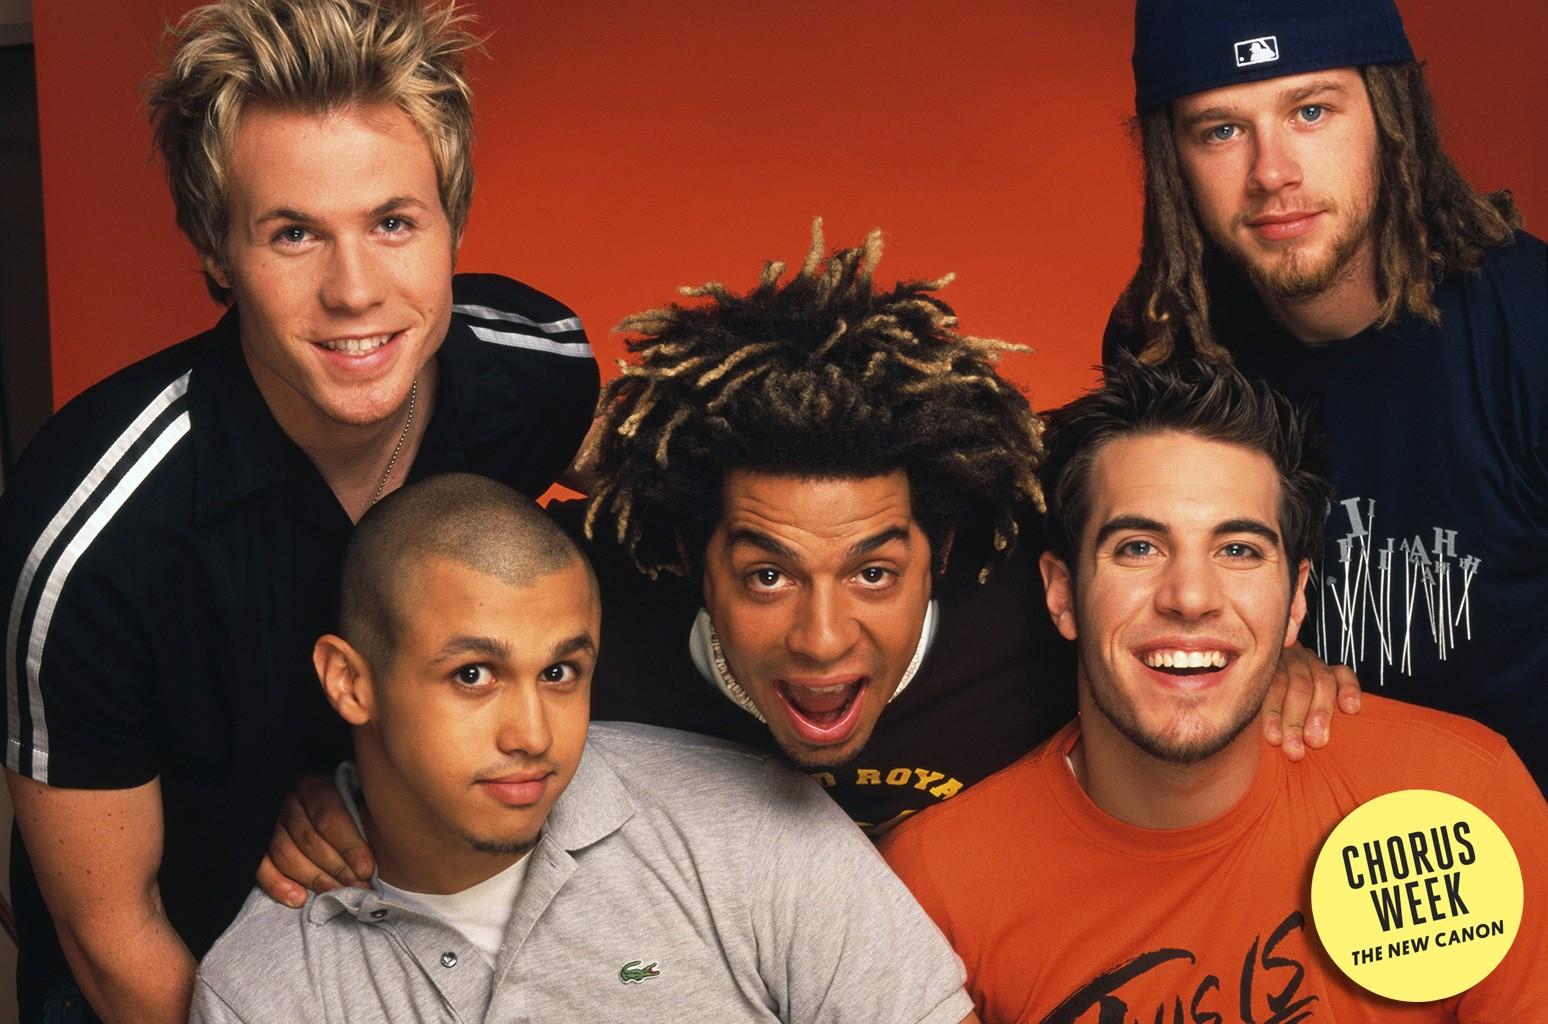 Erik-Michael Estrada, Dan Miller, Ashley Parker Angel, Trevor Penick and Jacob Underwood of O-Town photographed in 2001.